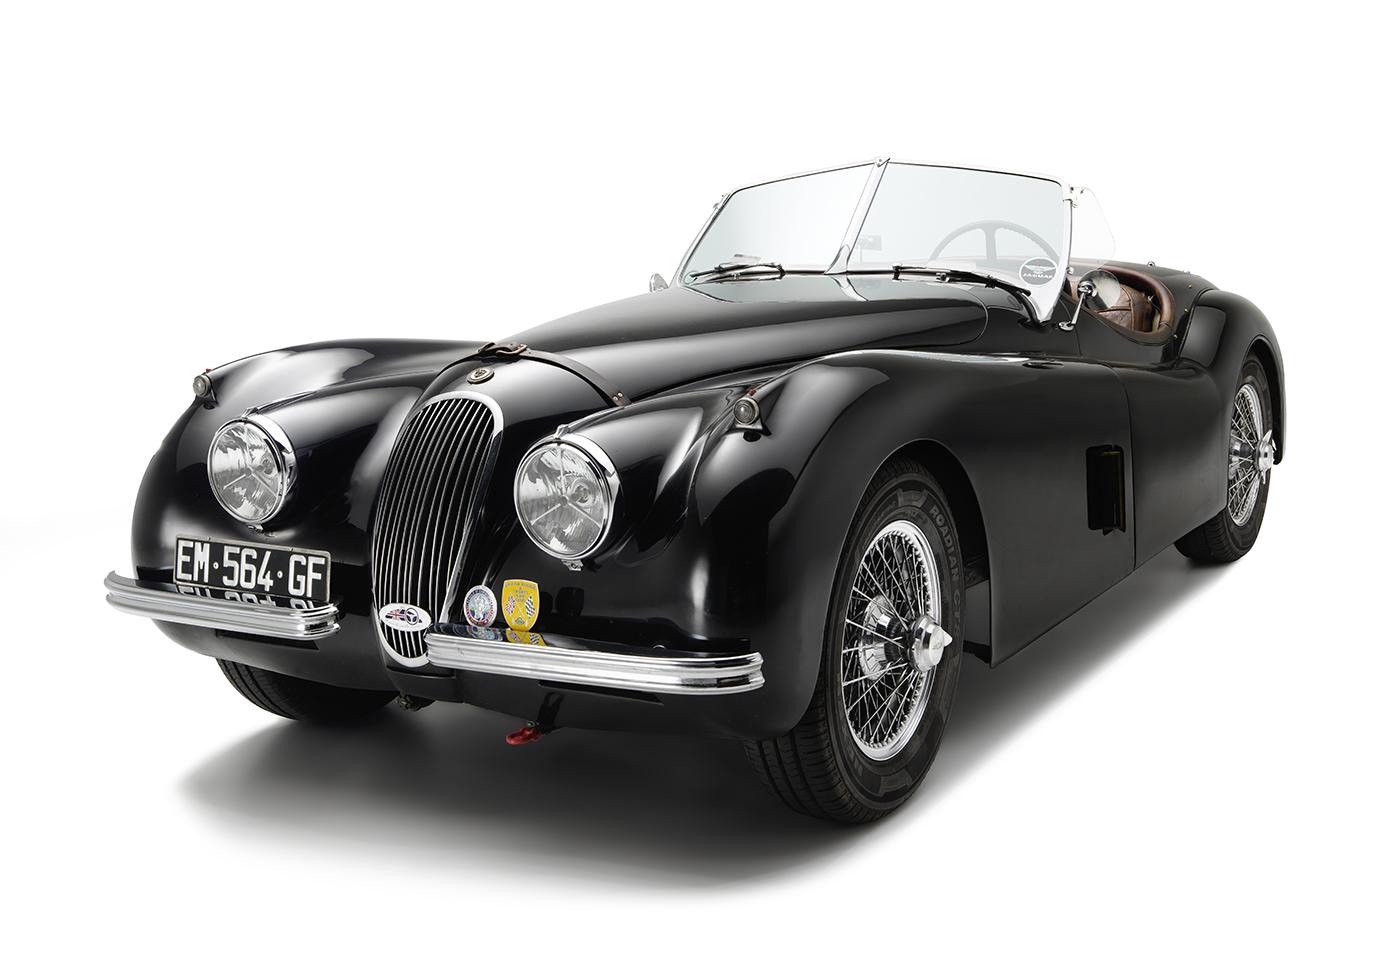 Vehicule-vintage-Jaguar-XK-120 -studio–grand-sud